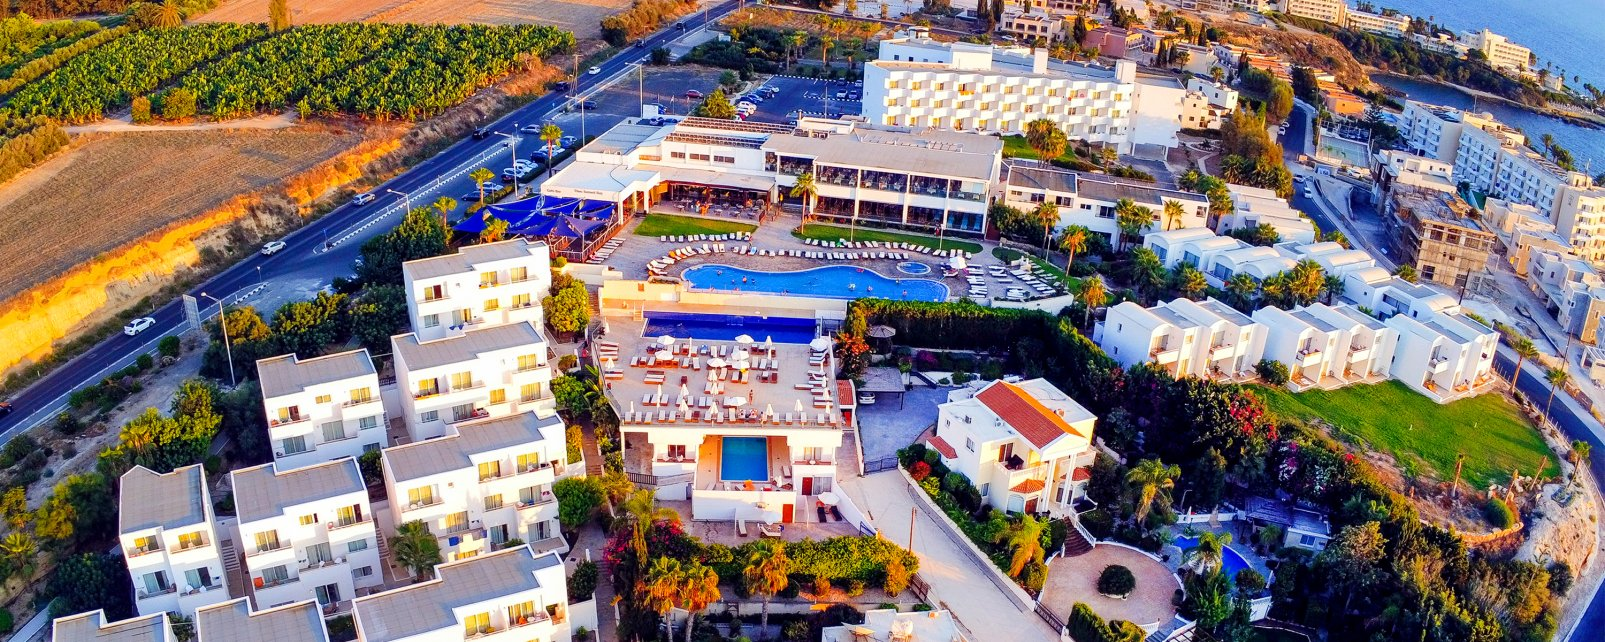 Hôtel Theo Sunset Bay Holiday Village